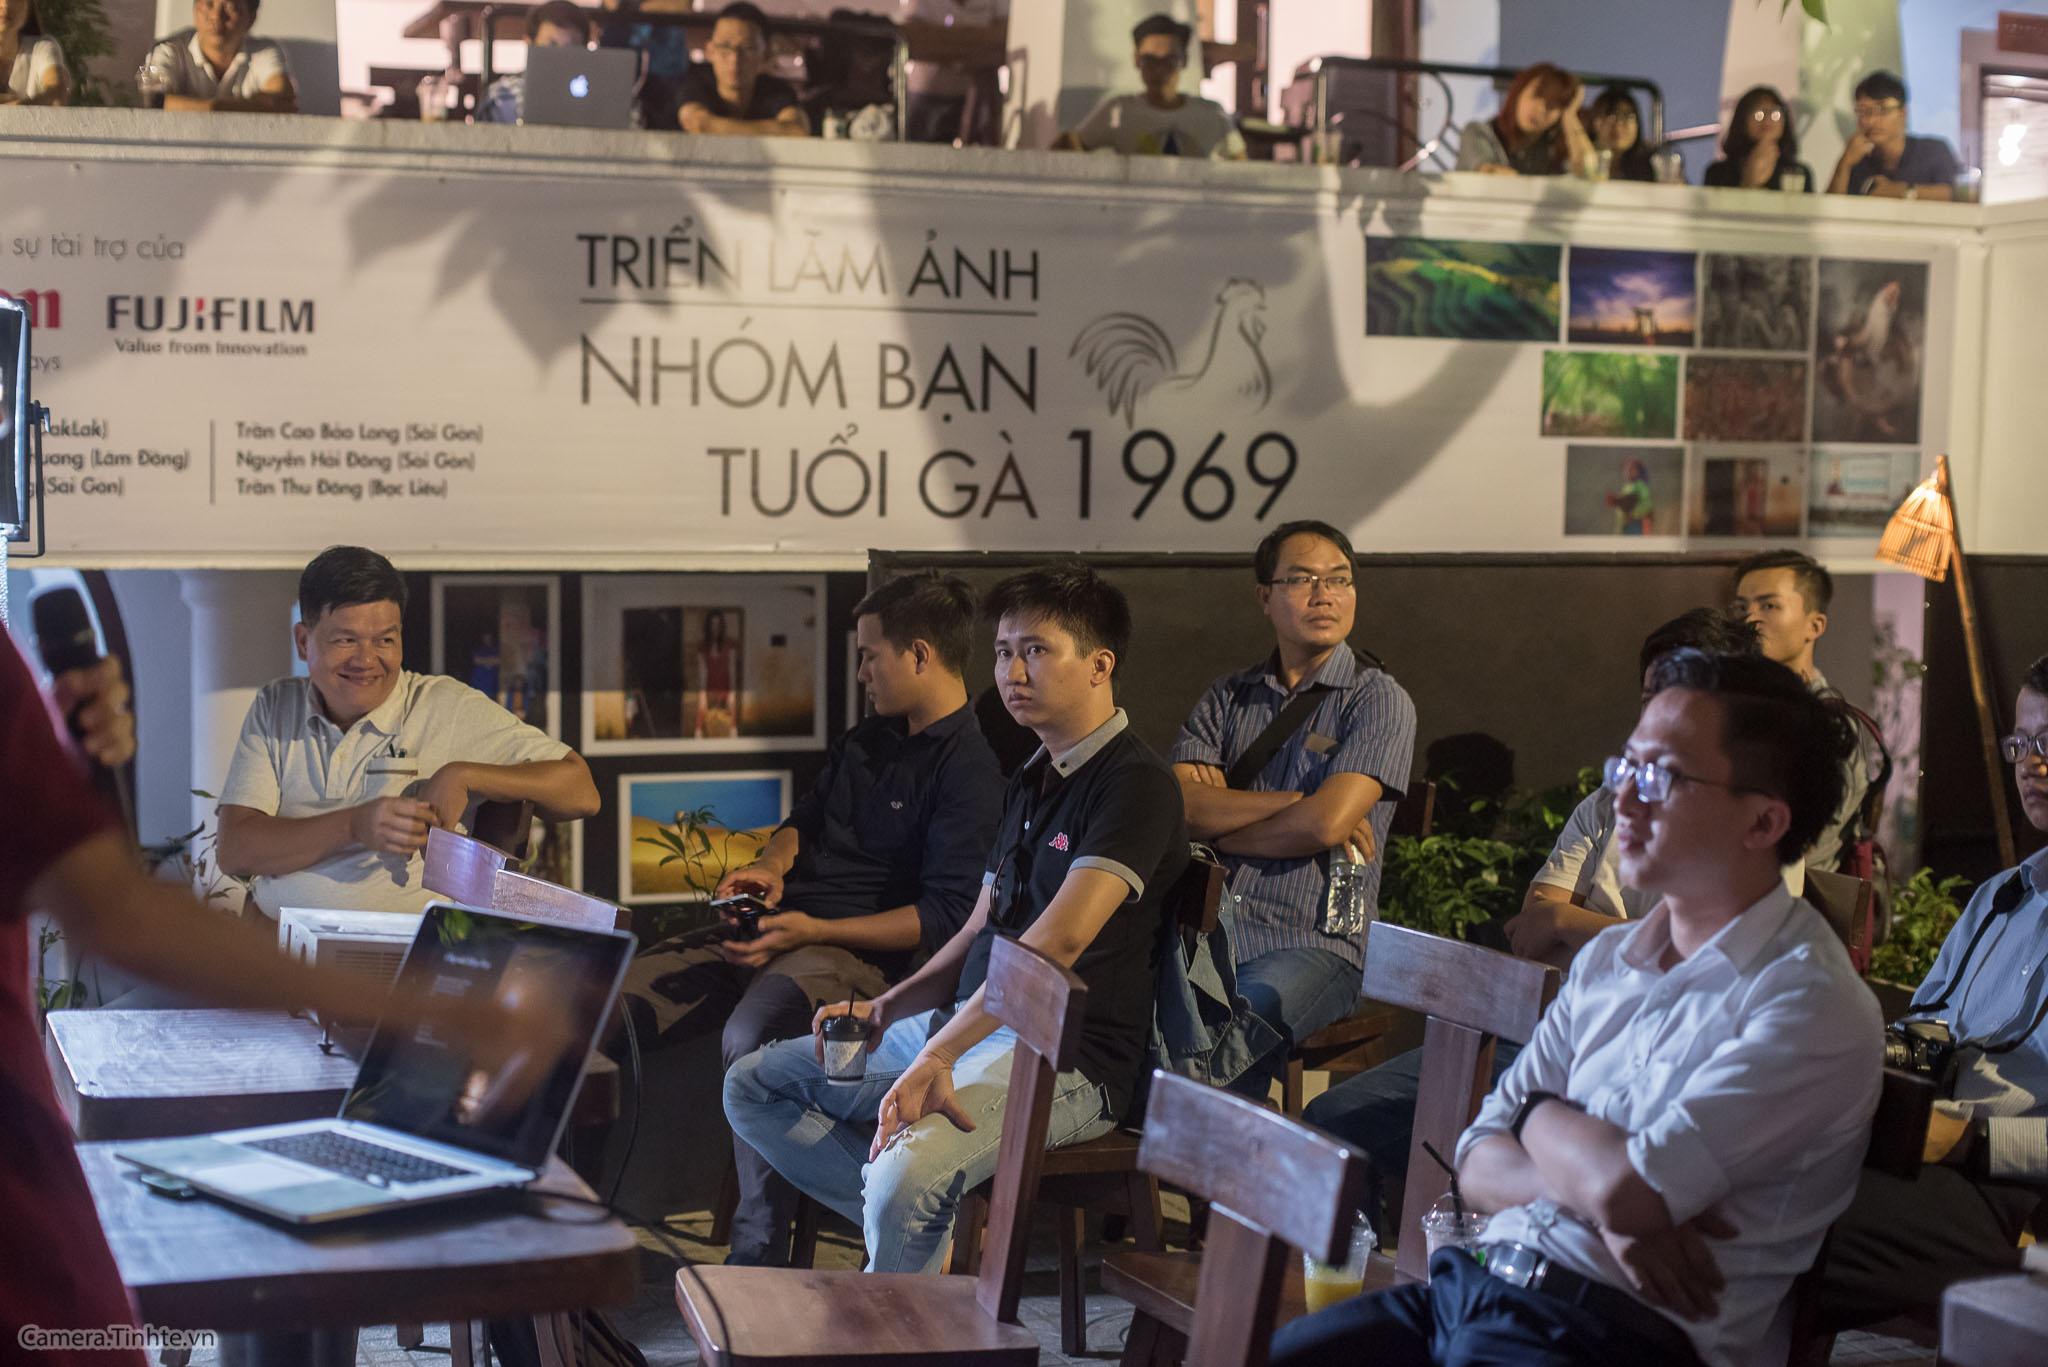 Camera Tinhte_Trien lam Nhom ban Tuoi Ga 1969_Bao Long_DSC_9075.jpg